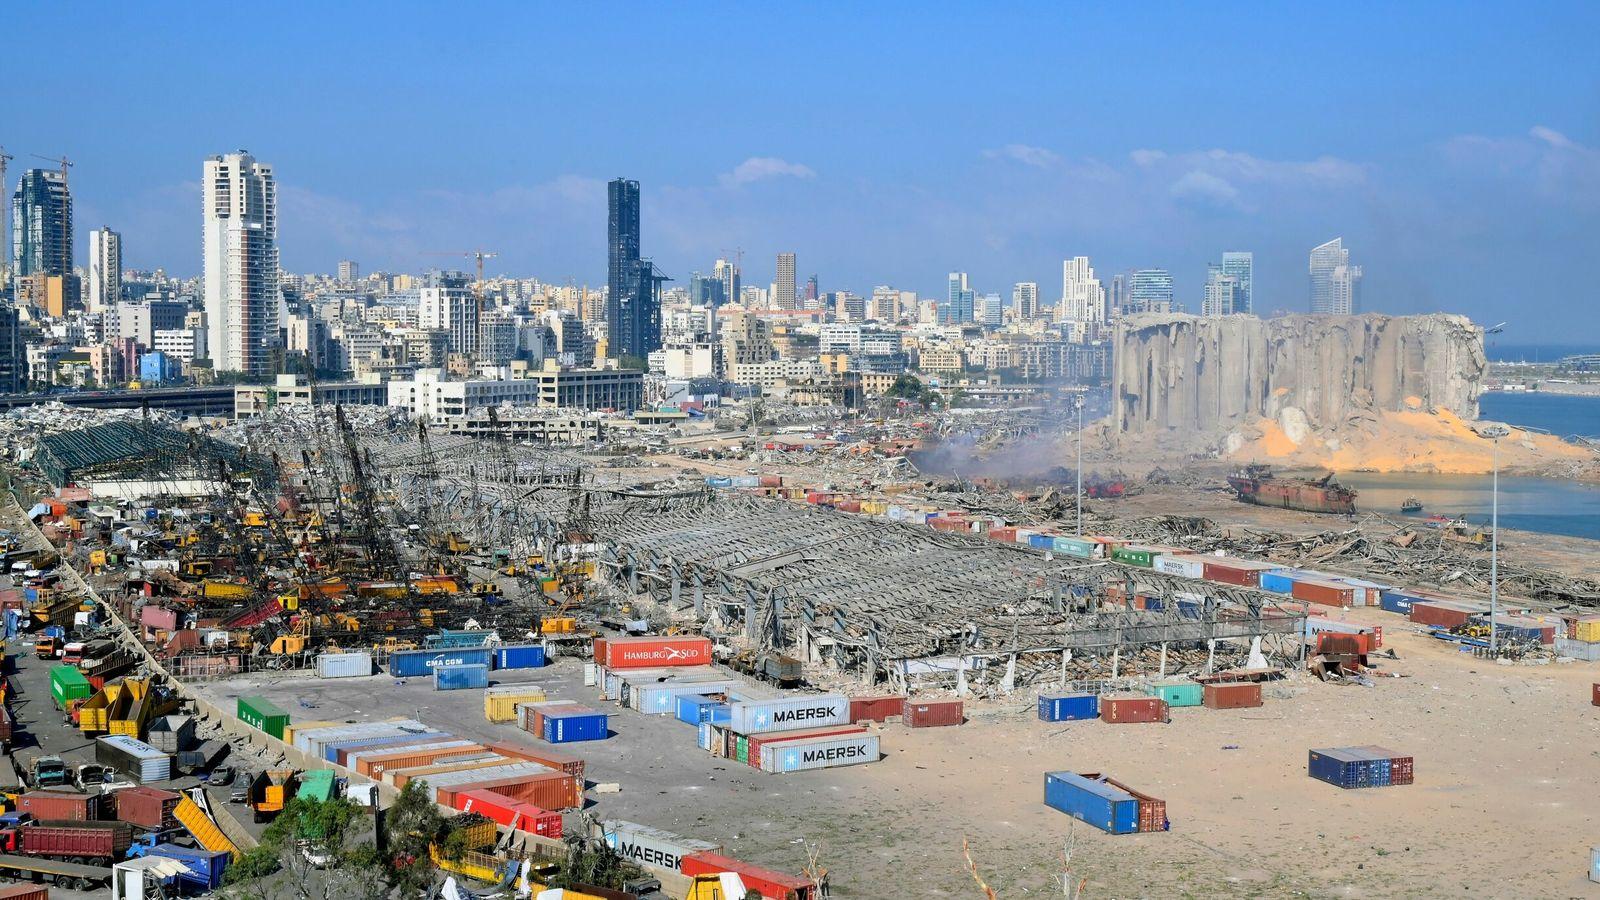 Aftermath of massive blast in Beirut. Pic: Wael Hamzeh/EPA-EFE/Shutterstock